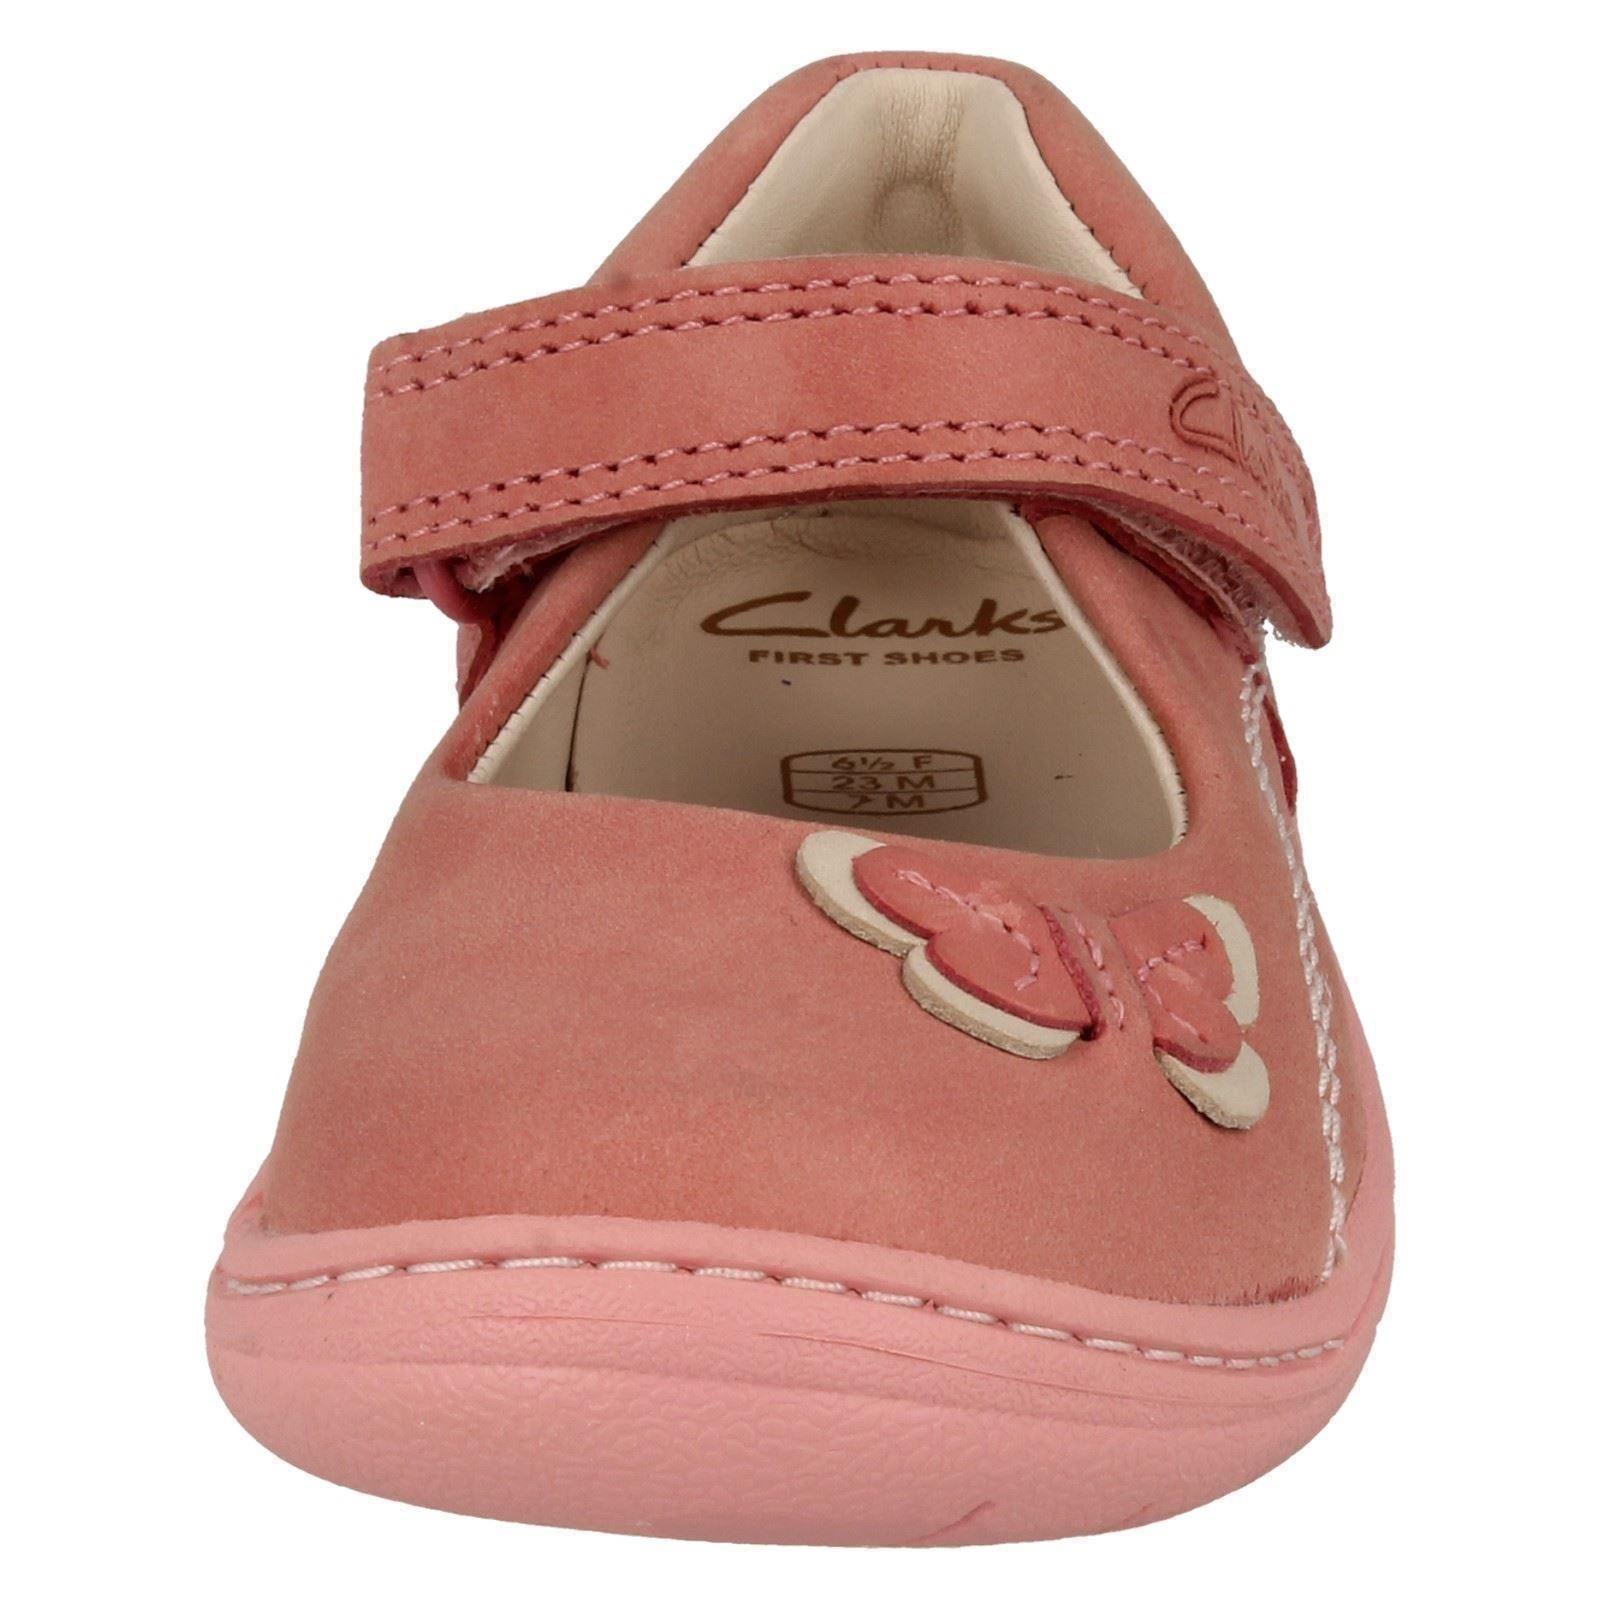 Infantil Chicas Clarks Primero Zapatos Suavemente Wow Mary Jane